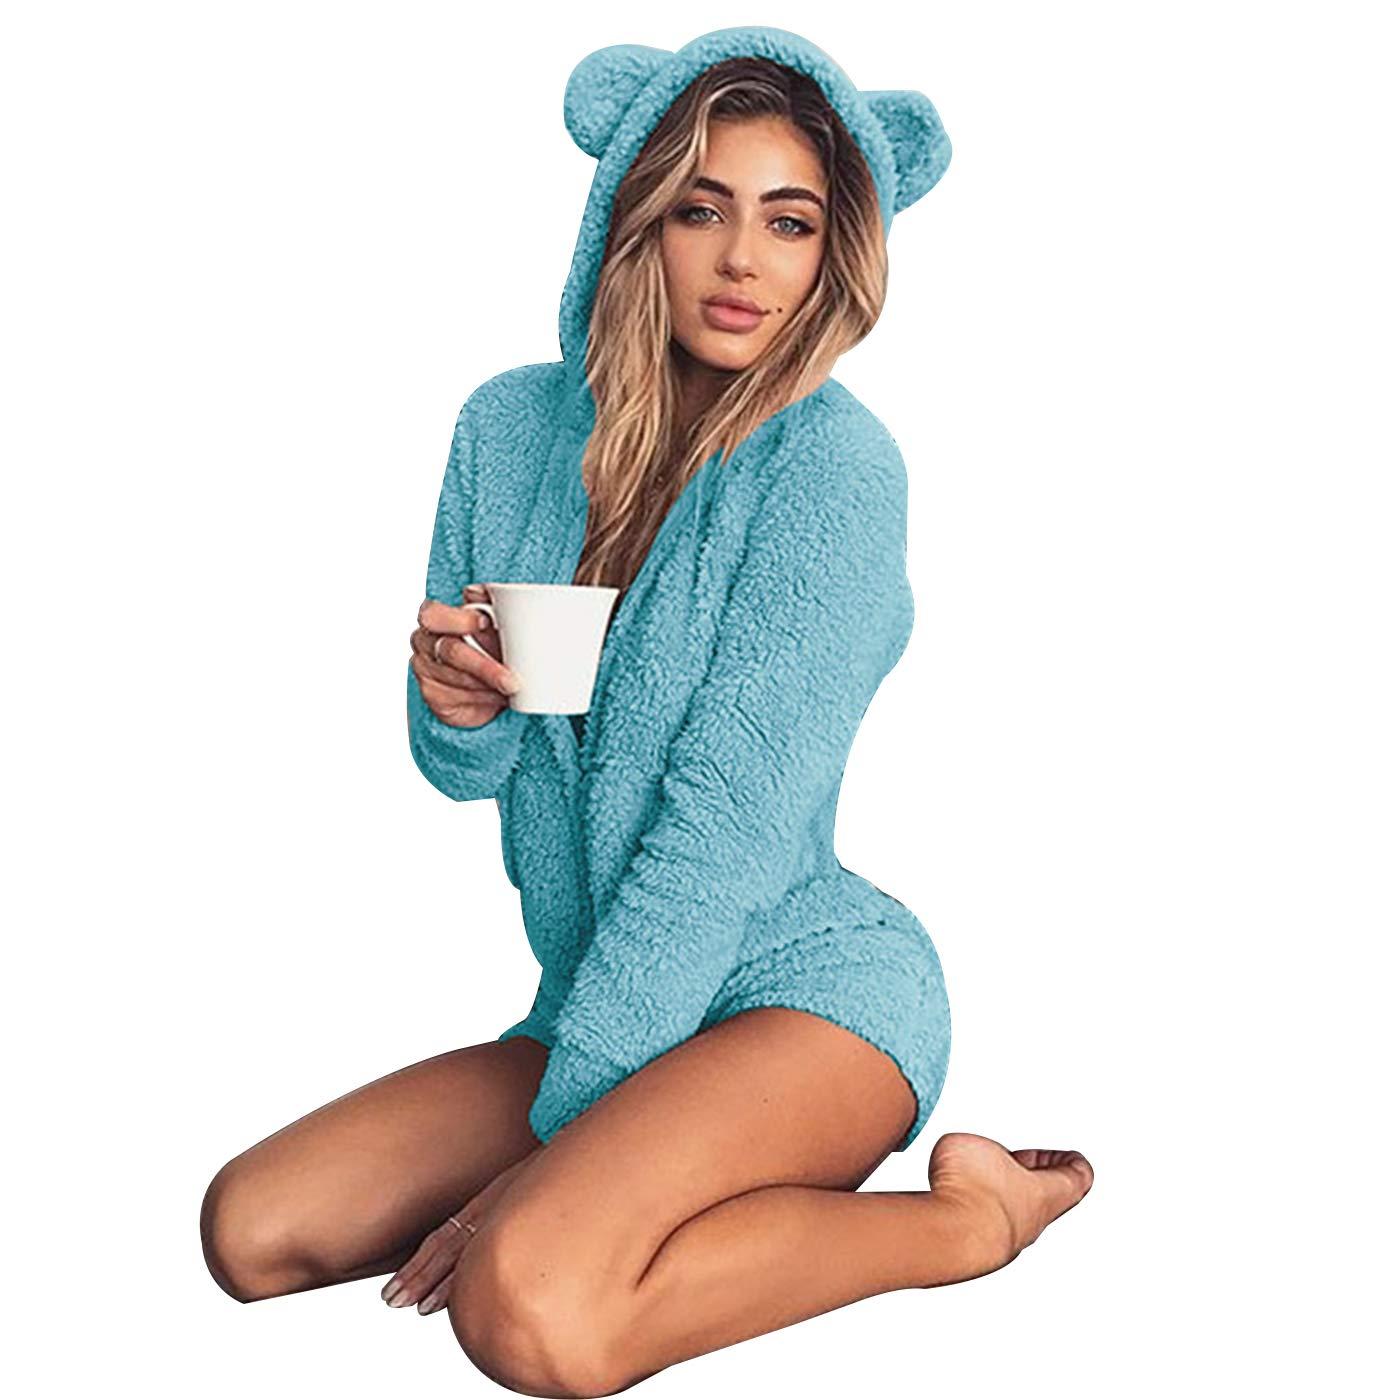 8e744b1bf7 Amazon.com  W. DRIZZLE Women Onesie Cute Fleece Pajamas Long Sleeve Zip Up  Hoodie and Shorts Sleepwear Jumpsuit Playsuit  Clothing